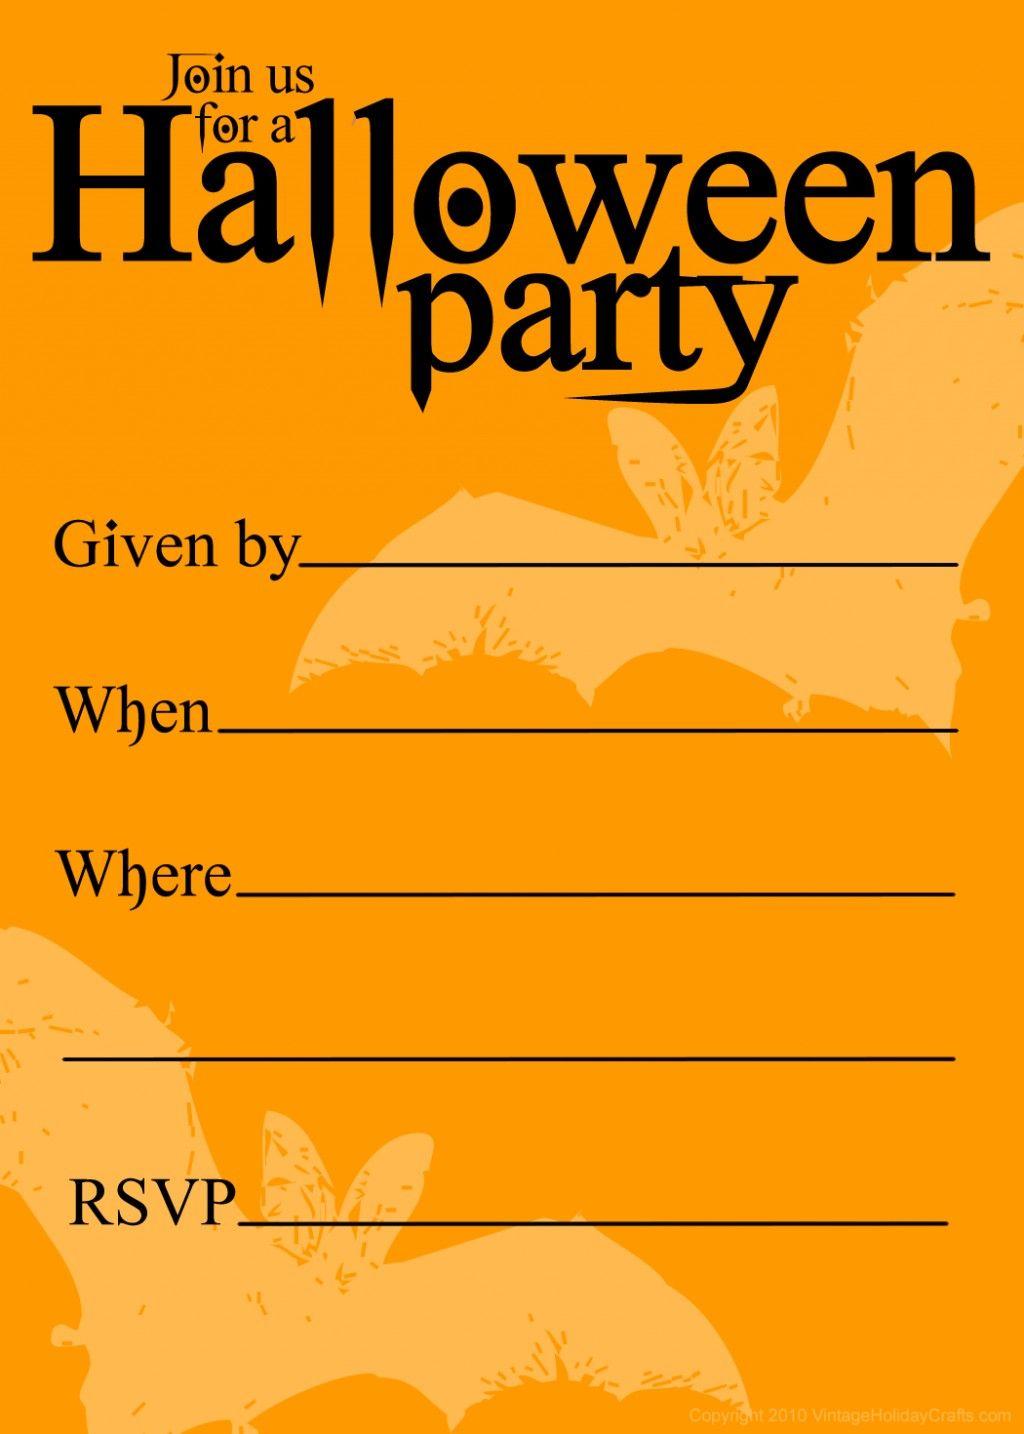 Free Printable Halloween Birthday Invitations Templates   Halloween - Free Printable Halloween Party Decorations